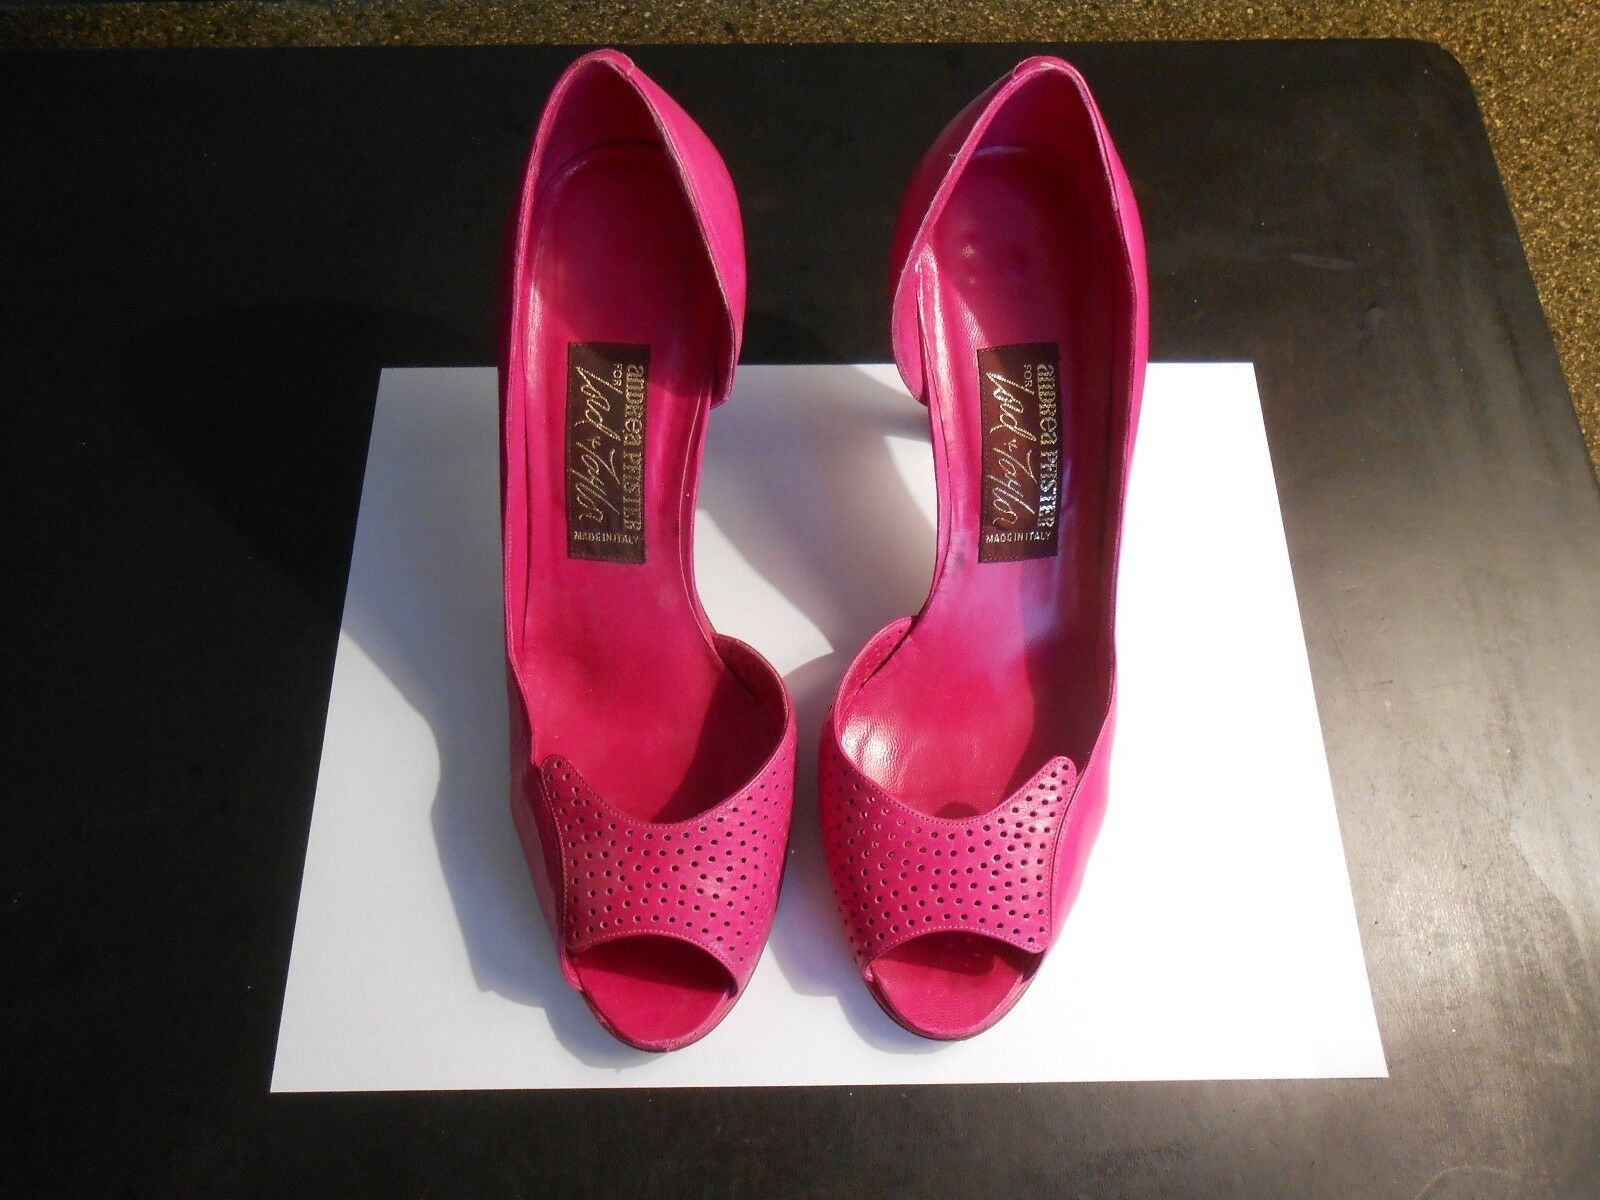 marchio in liquidazione ANDREA PFISTER (MADE (MADE (MADE IN ITALY) rosa OPEN TOE PUMPS--6 1 2M  vendita scontata online di factory outlet